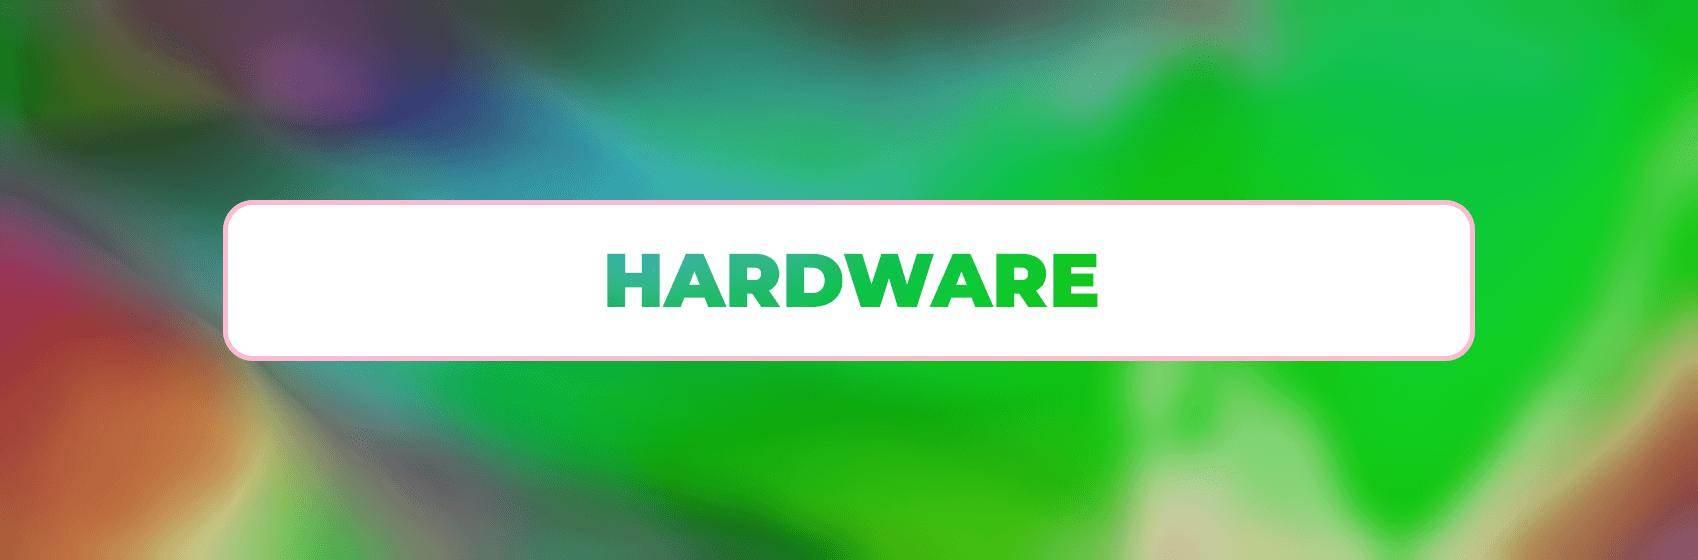 Hardware Title